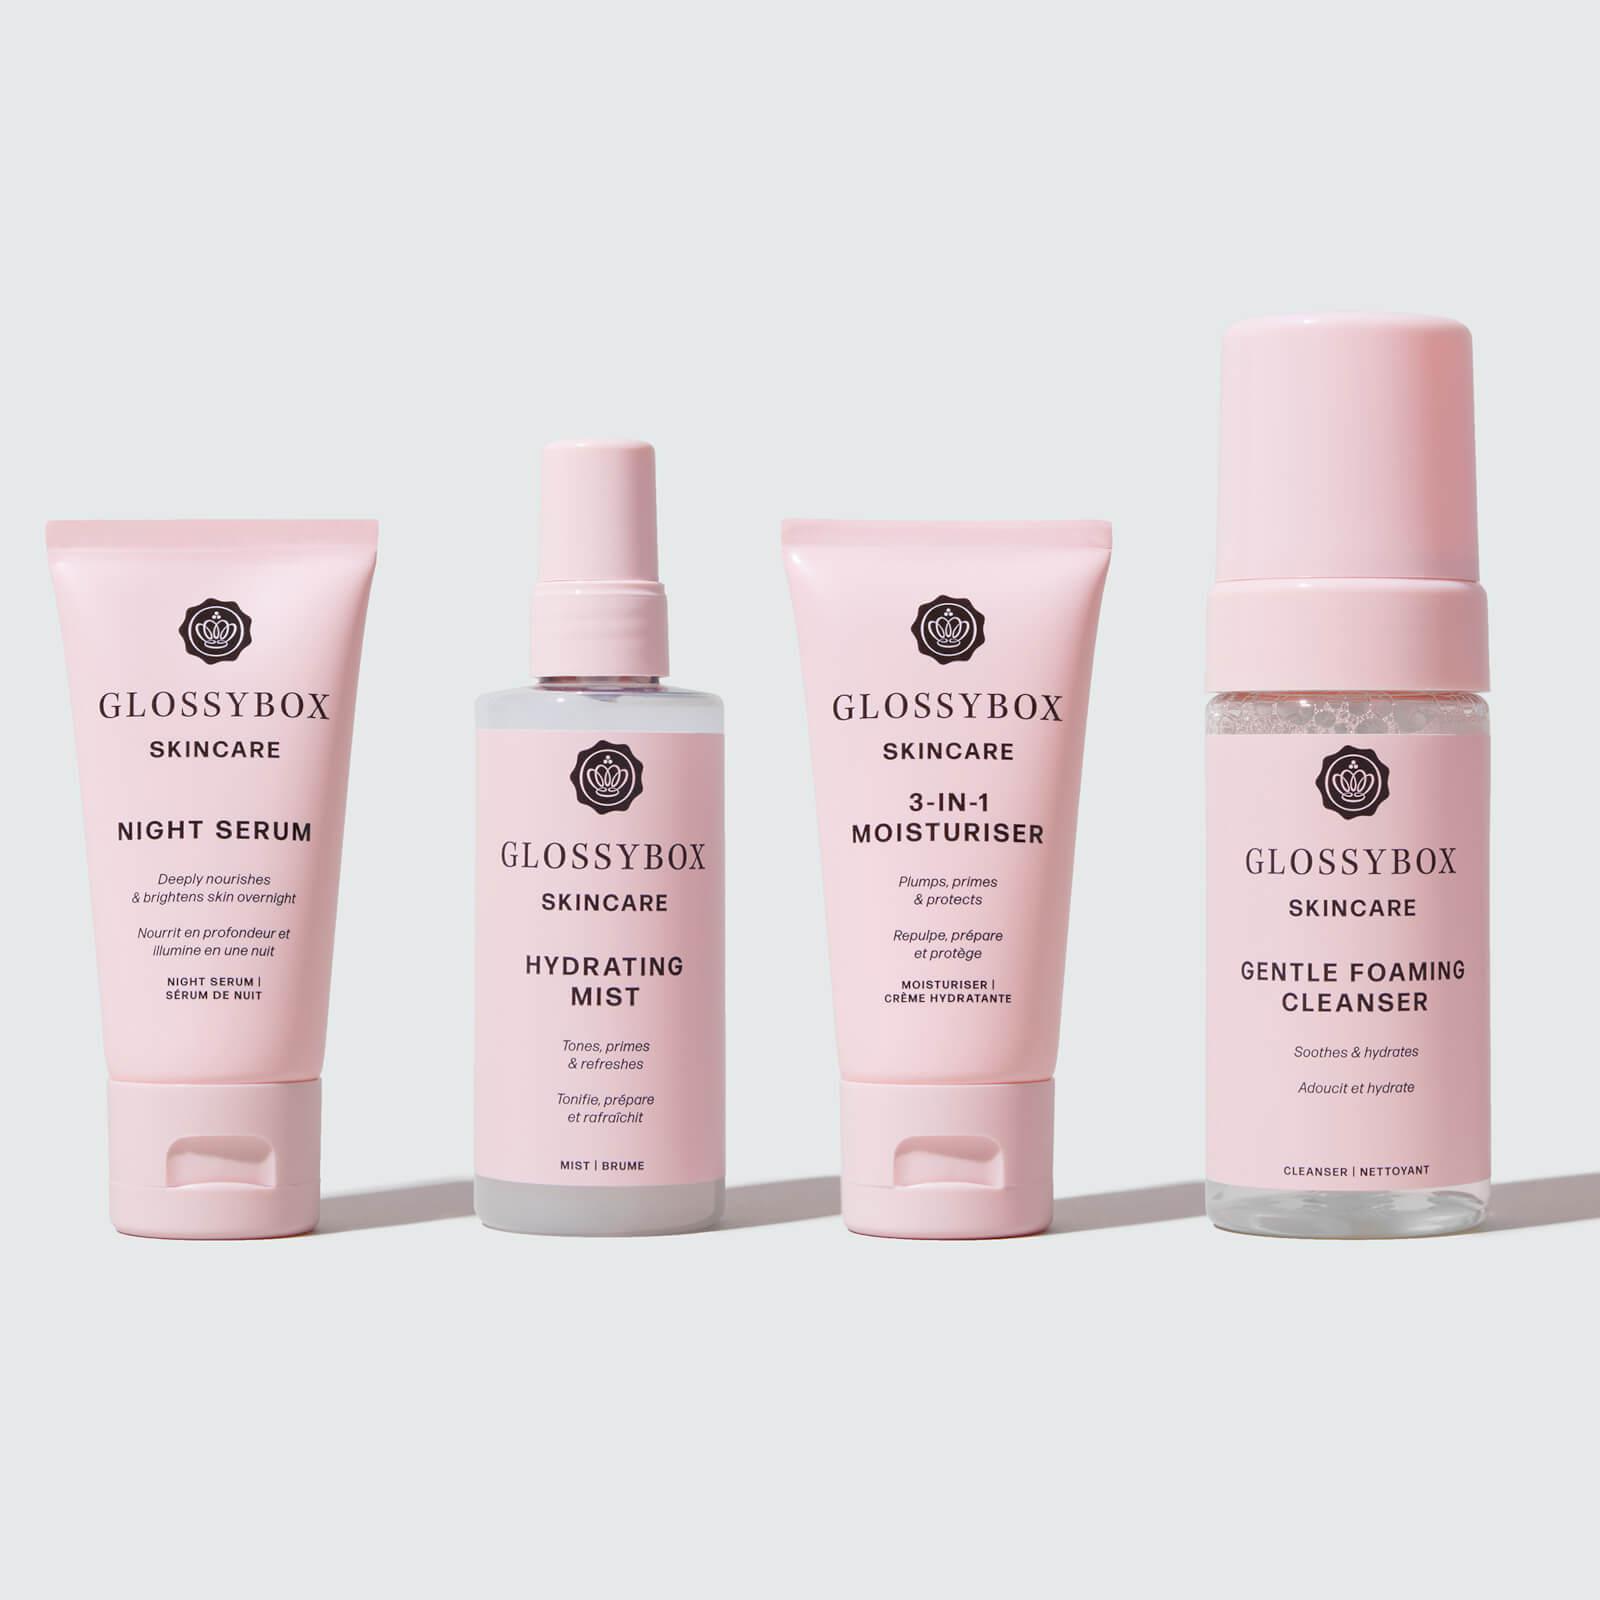 Glossy Box coupon: GLOSSYBOX Skincare Hydrate & Cleanse Bundle (Worth $88.00)